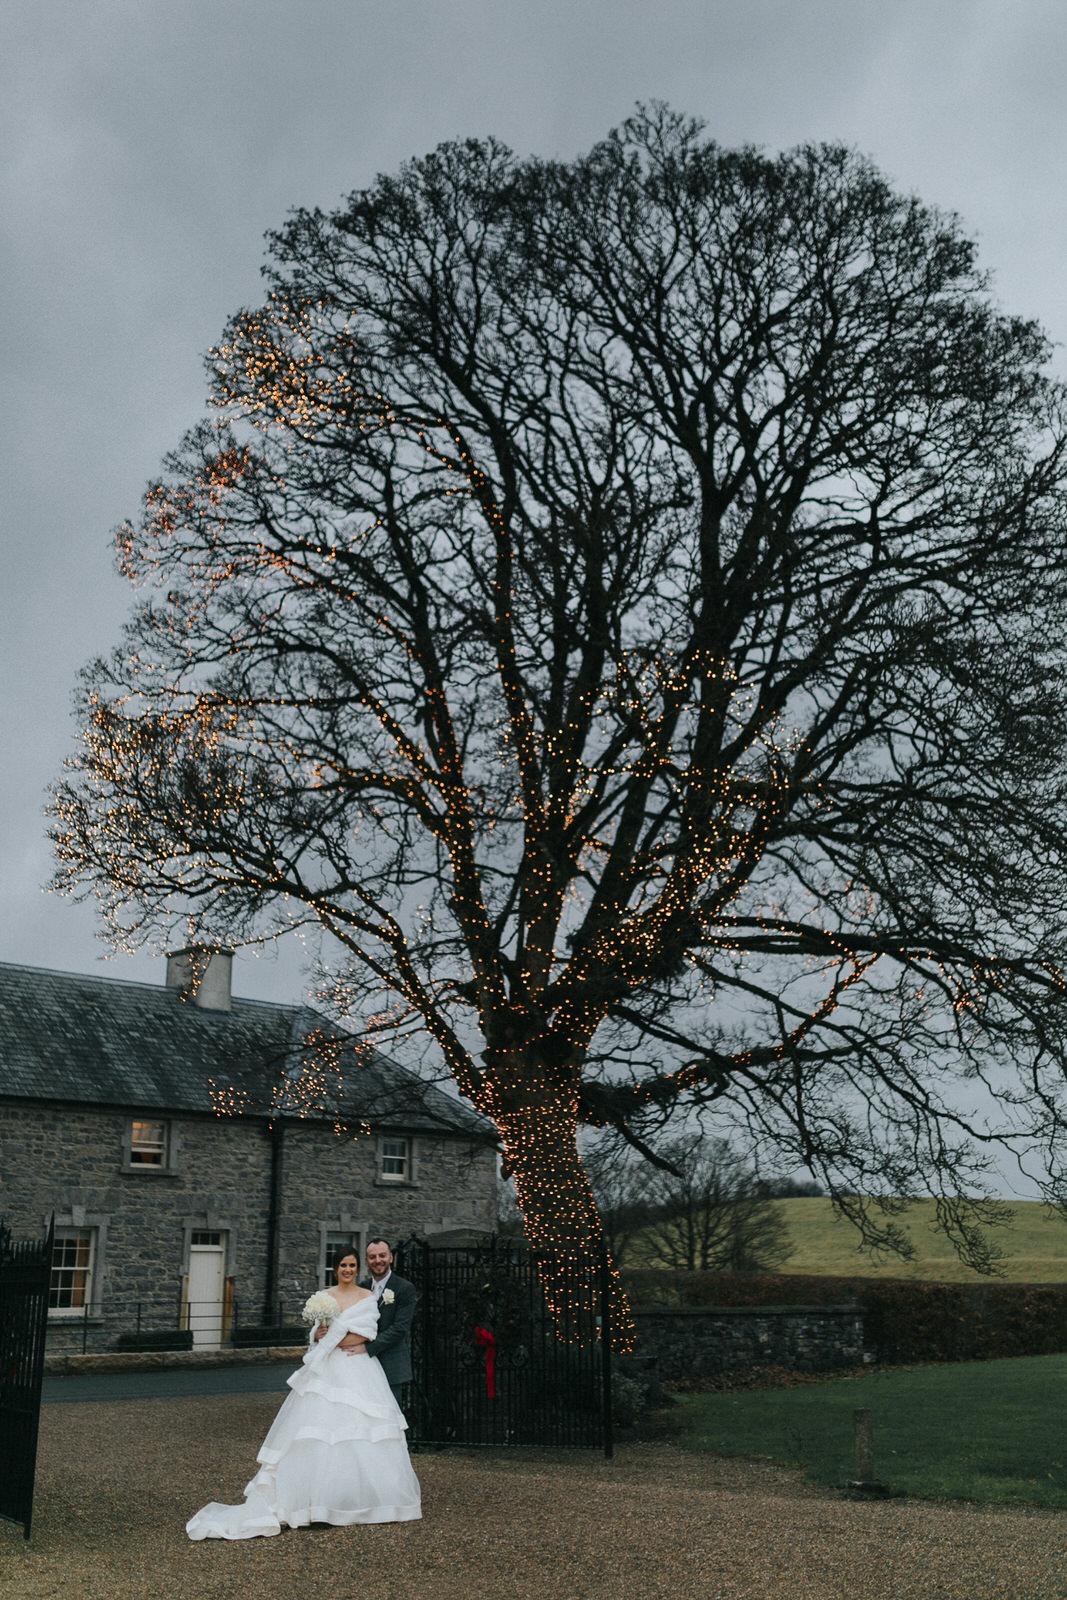 Clonabreany_wedding-photographer_roger_kenny_ireland_073.jpg